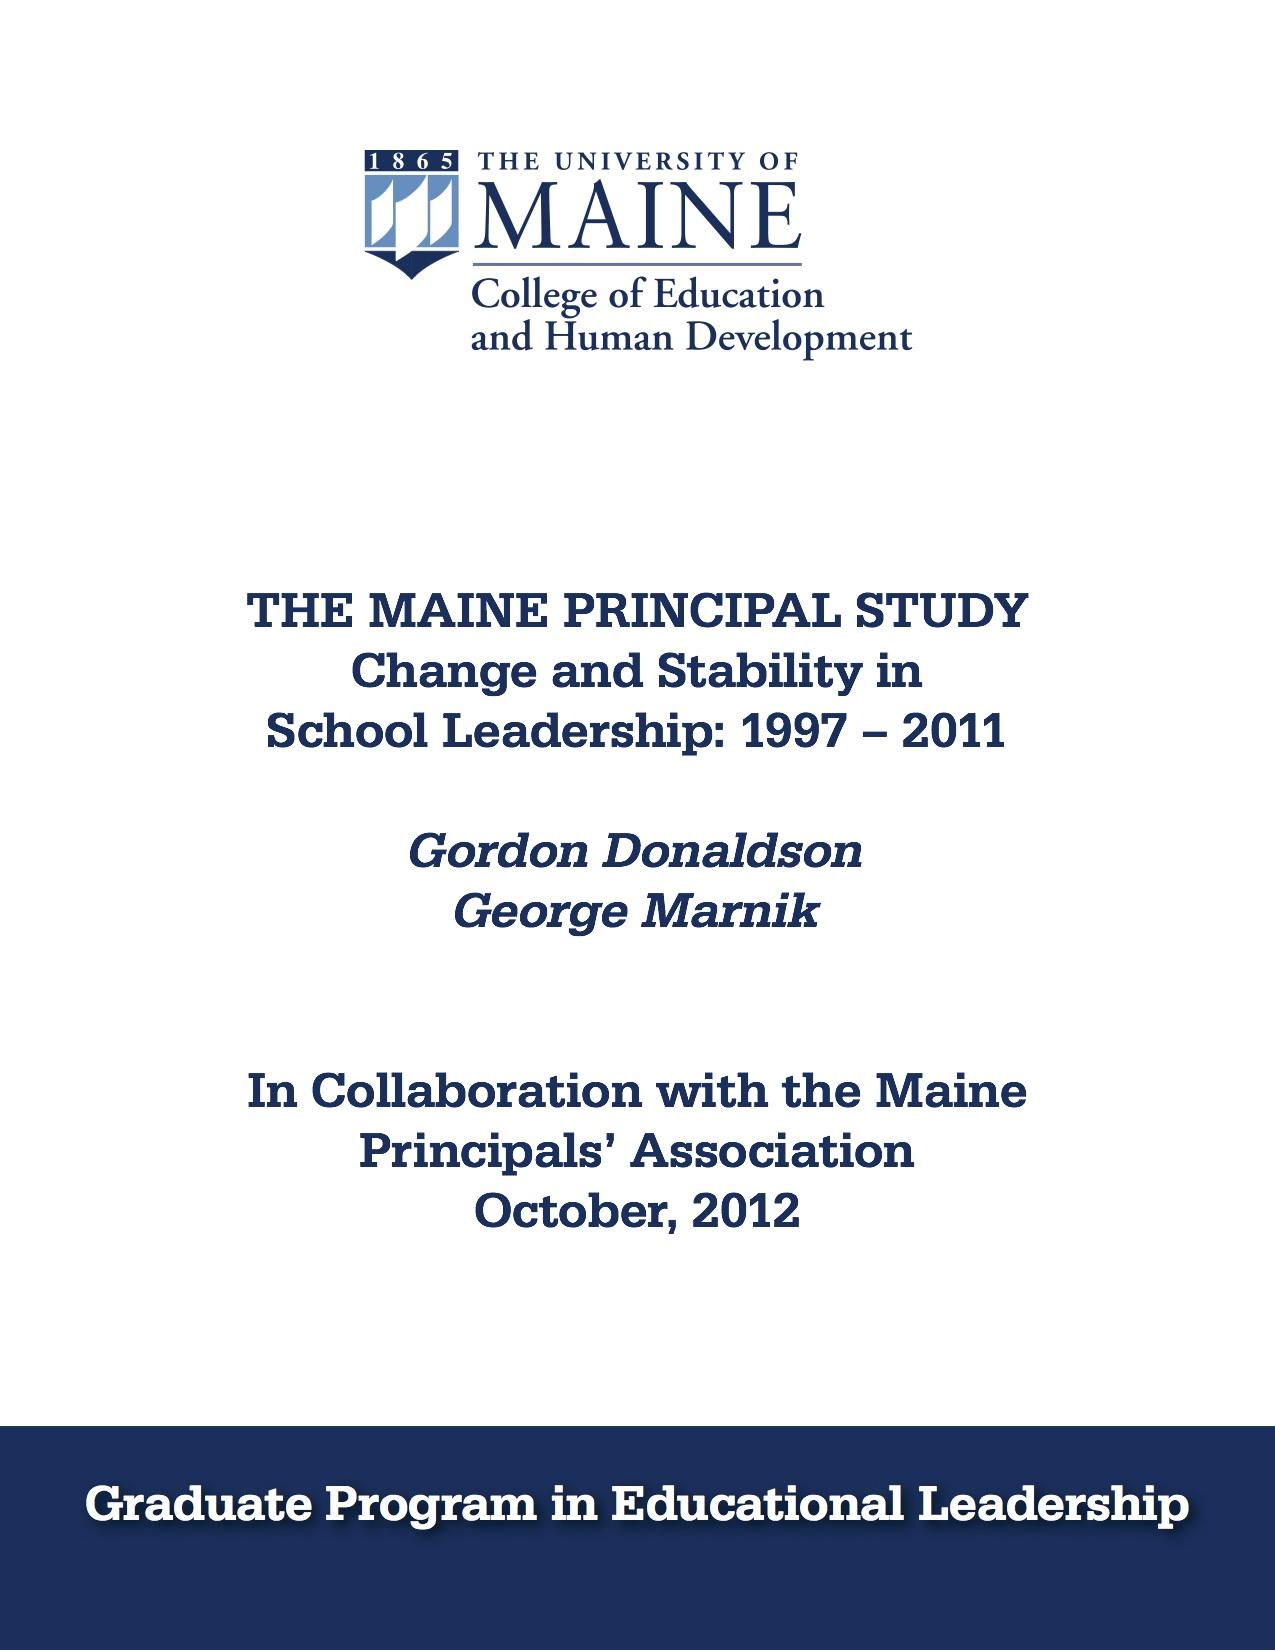 Maine Principal Study picture